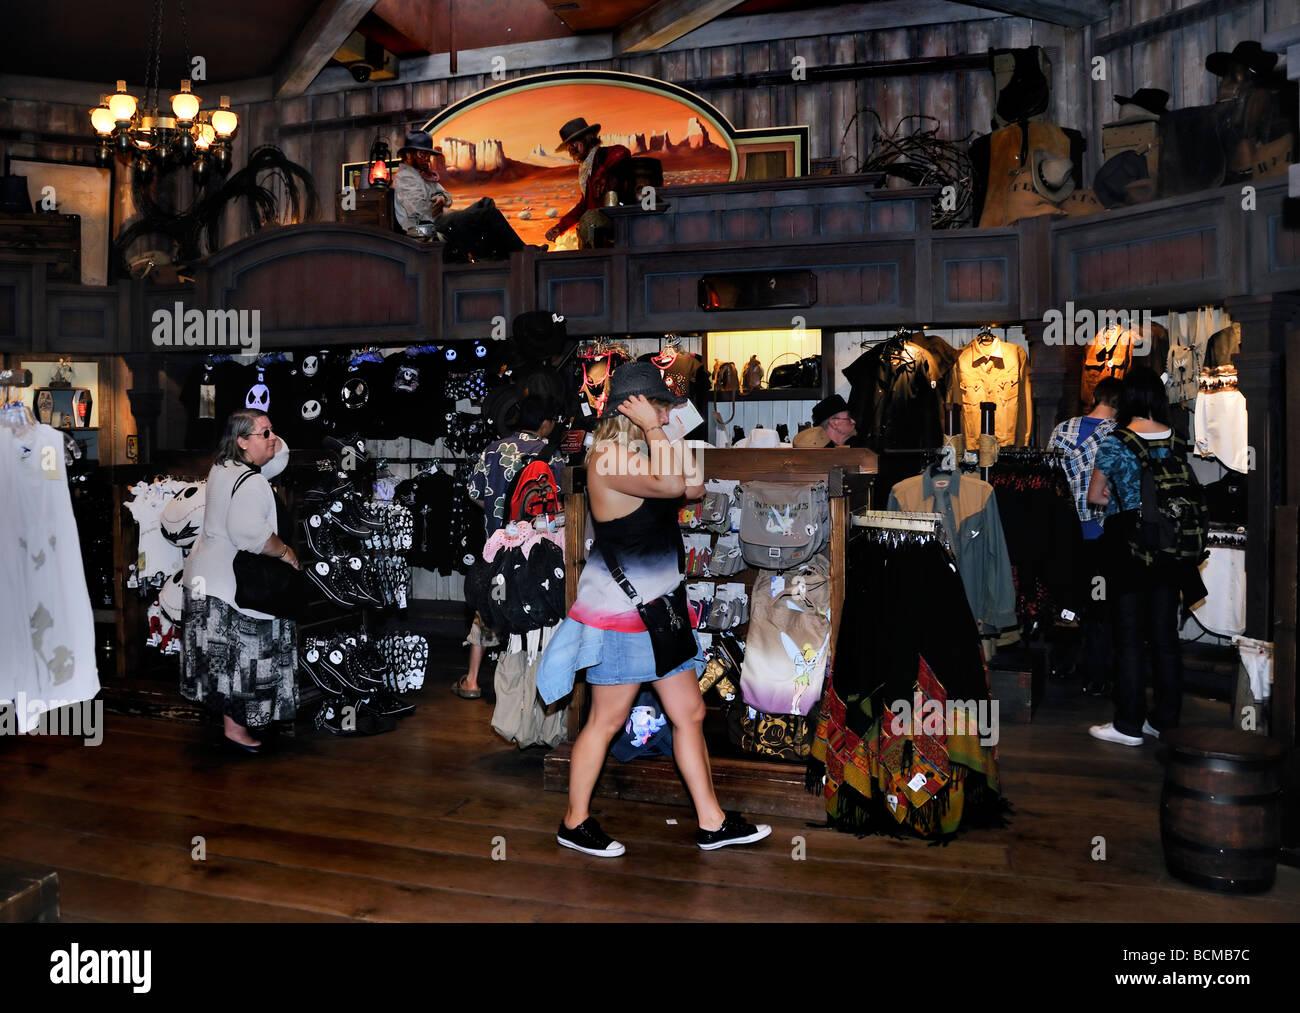 Paris France Teens Shopping 'Disneyland Paris' Tourists in 'Frontier land' Gift Store - Stock Image